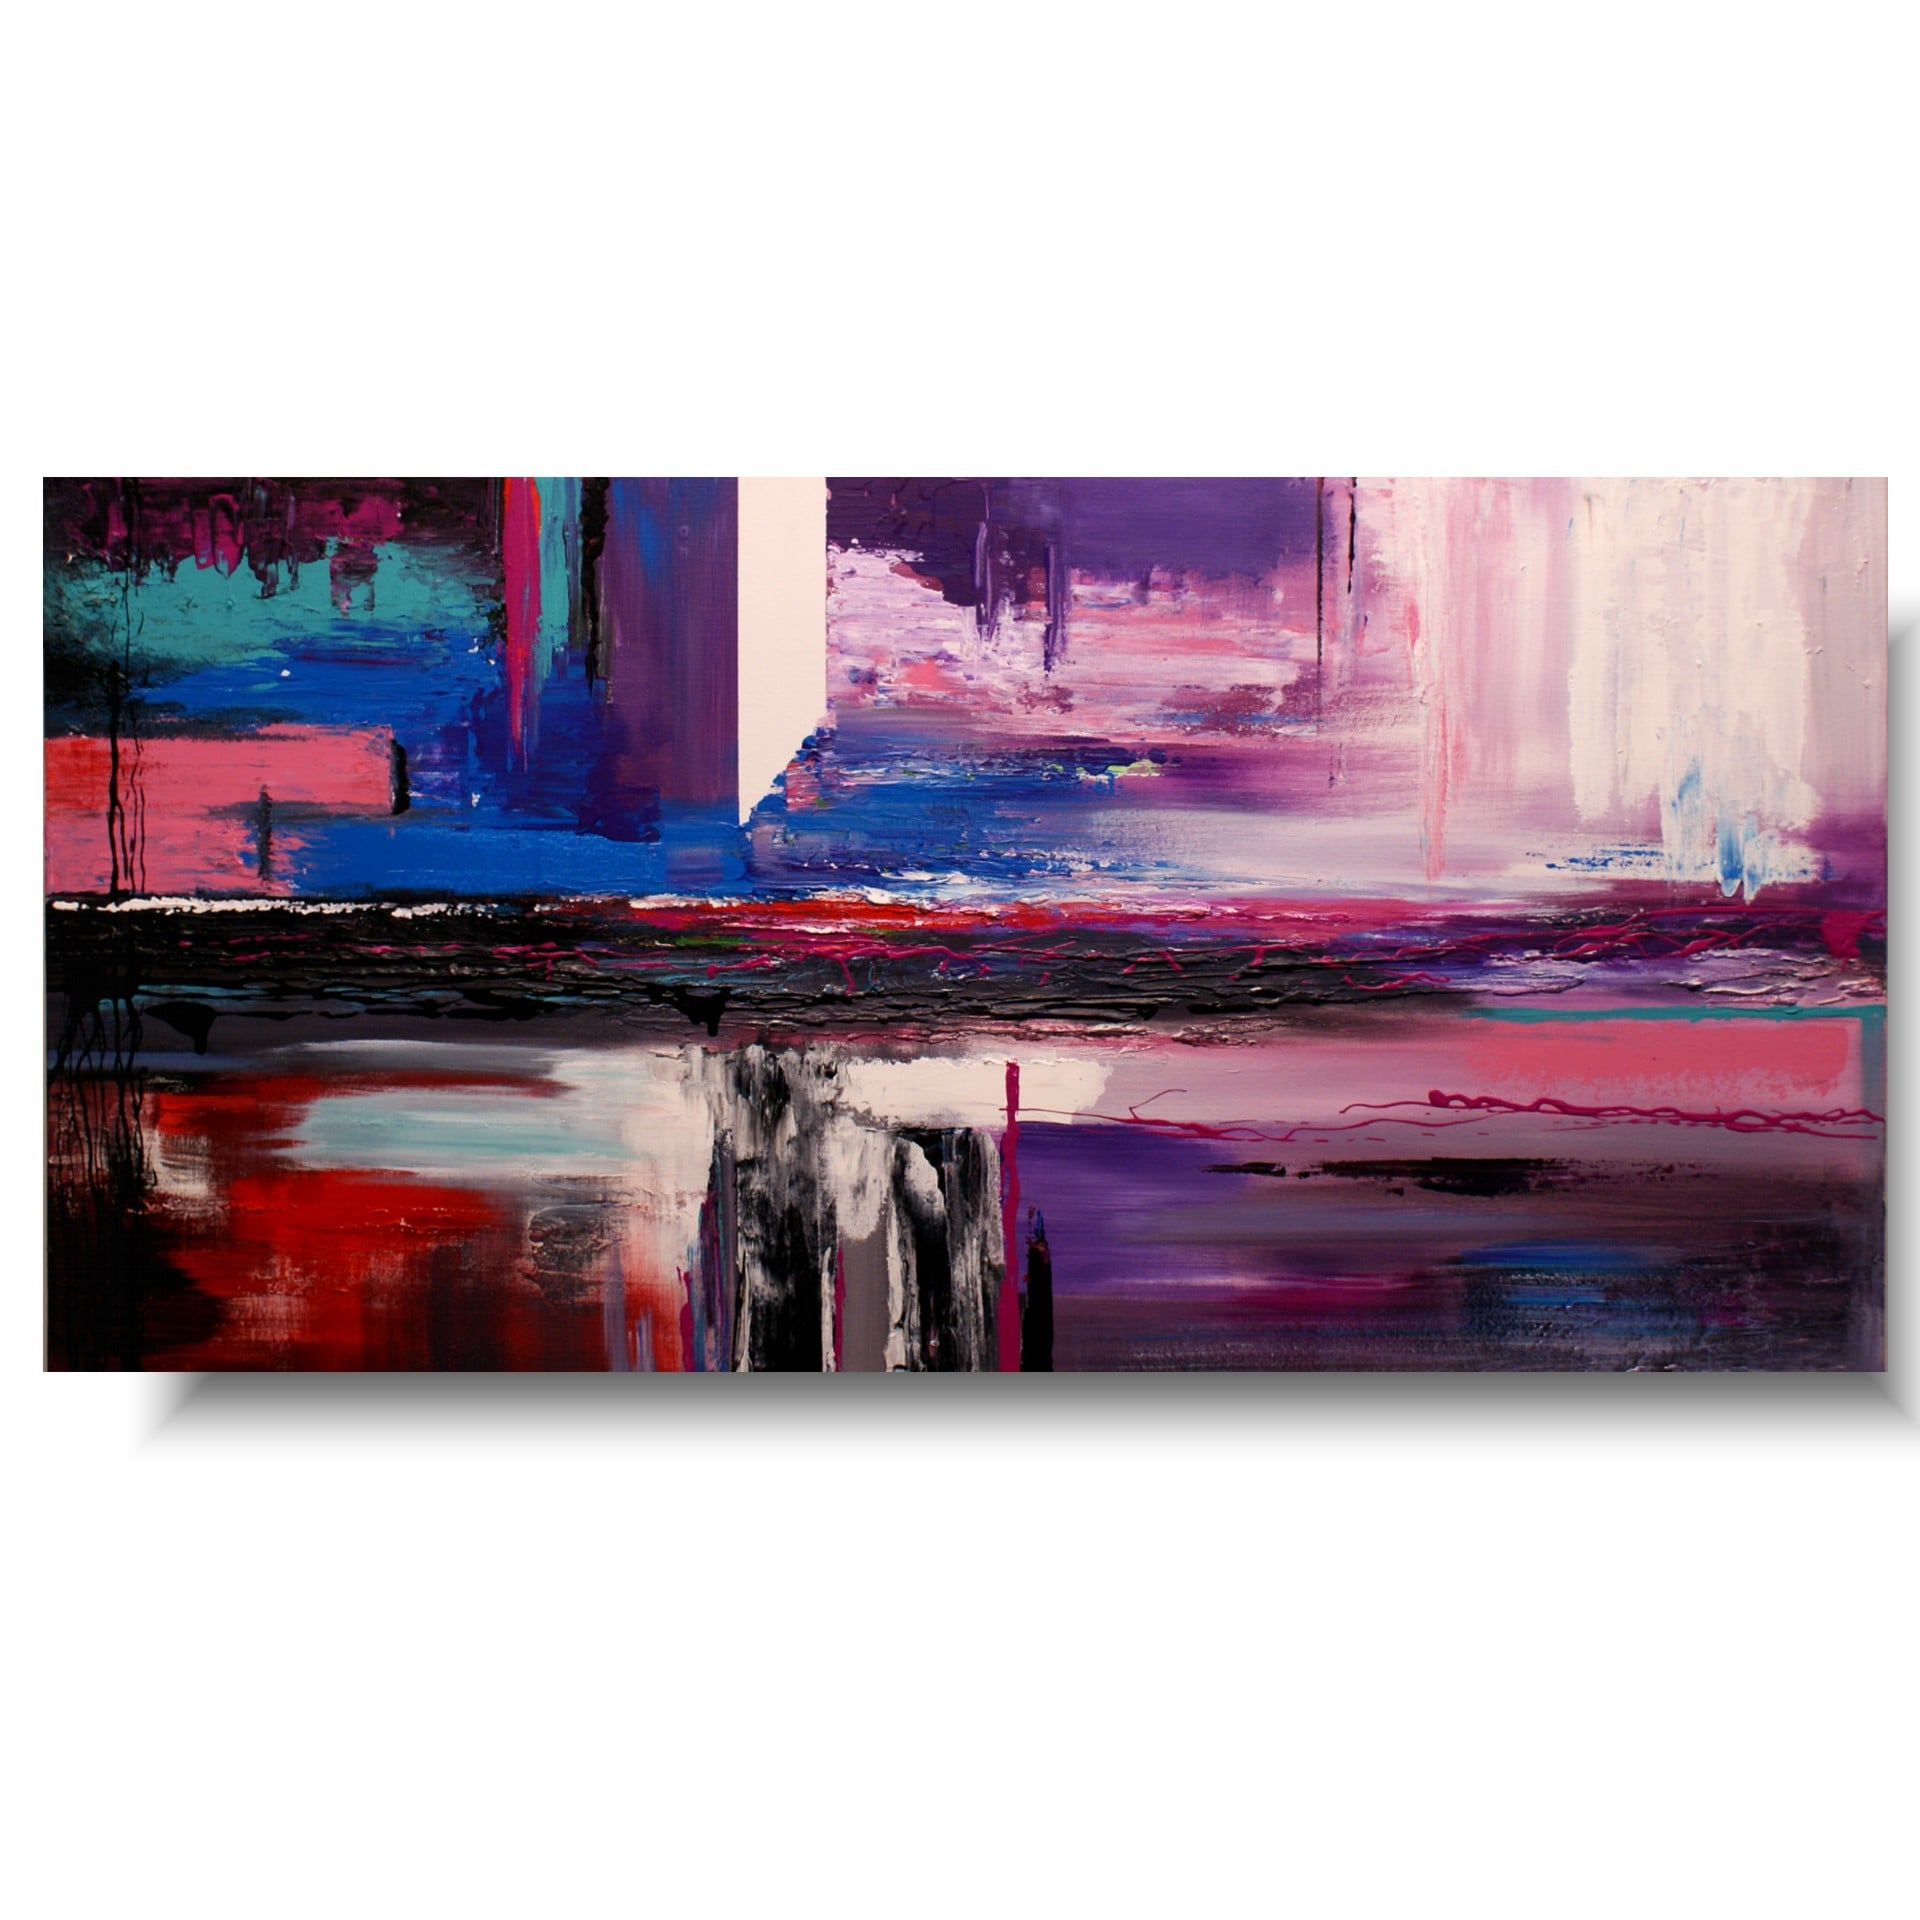 Obrazy abstrakcje słodka przestrzeń 1363A